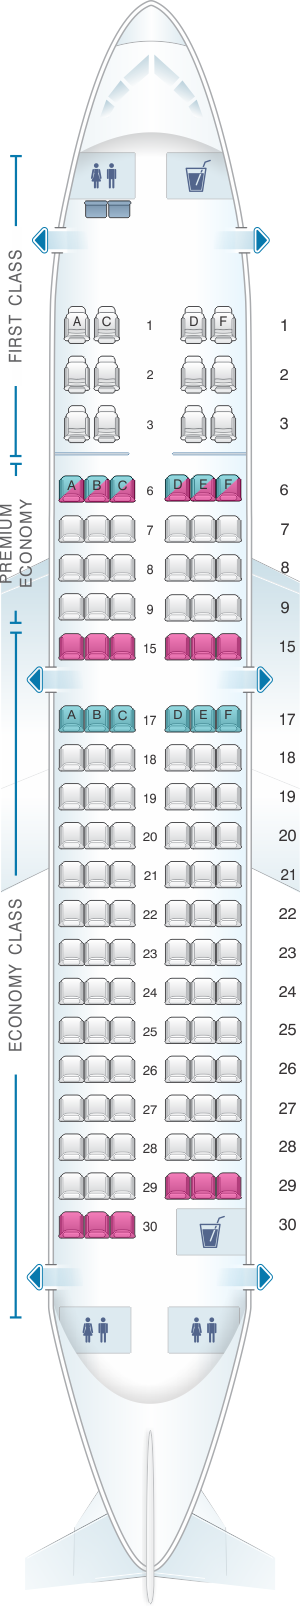 Seat map for Alaska Airlines - Horizon Air Airbus A319 112 retrofit